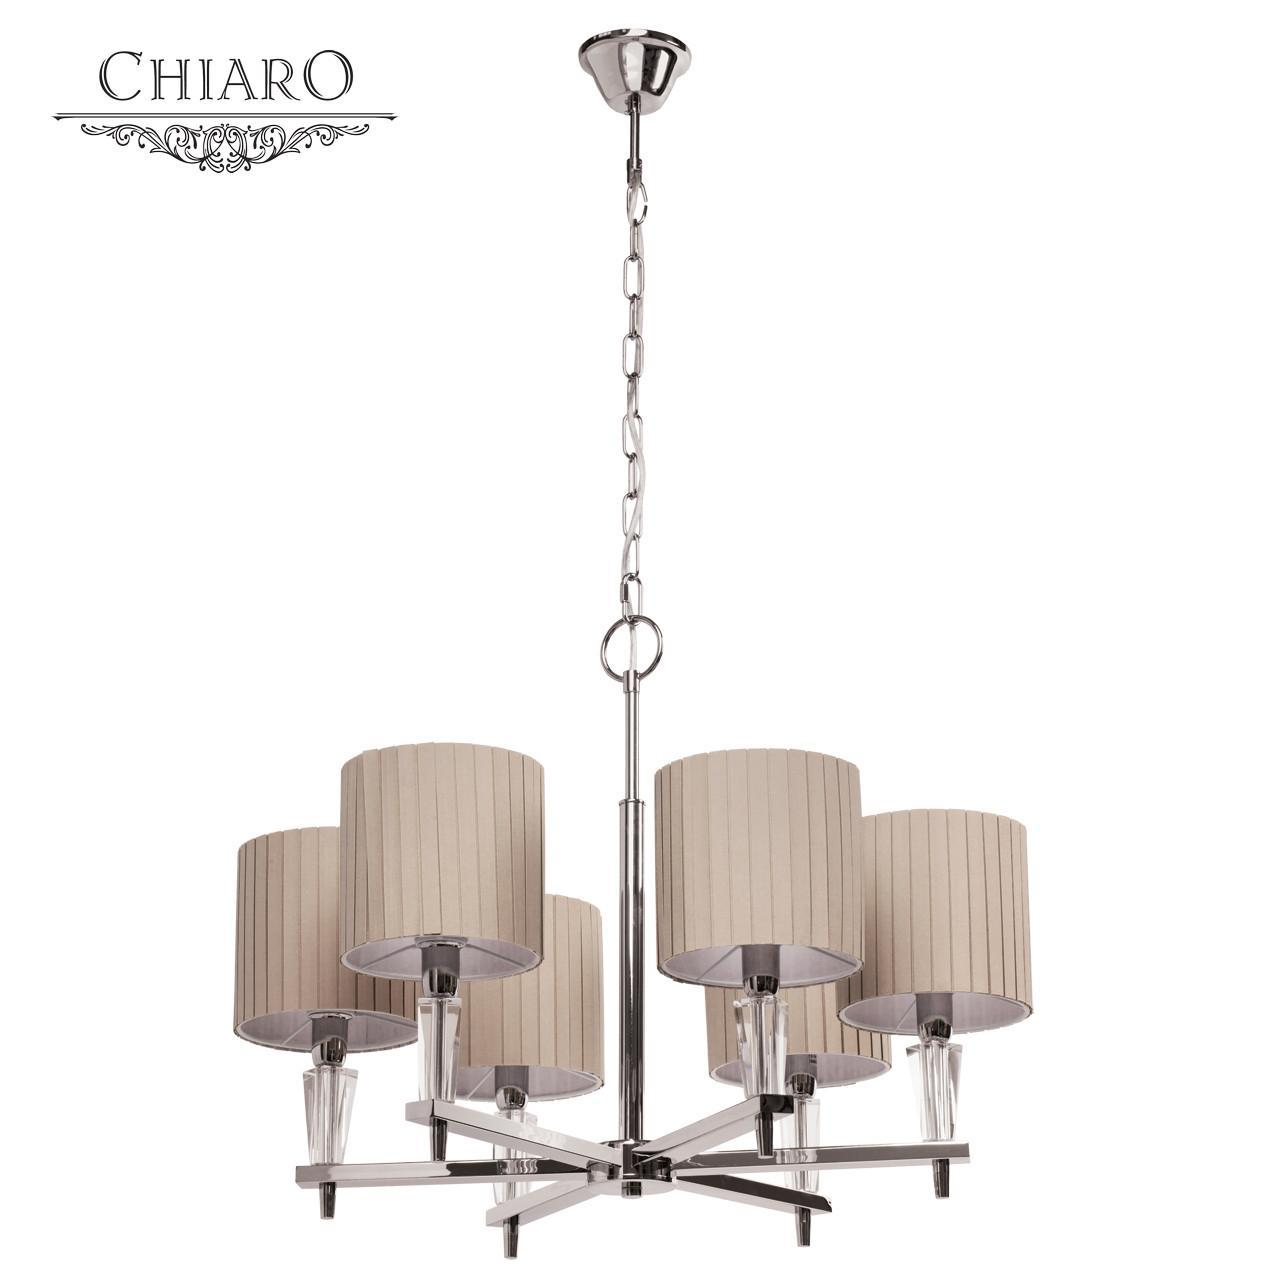 Подвесная люстра Chiaro Инесса 460010806 chiaro подвесная люстра chiaro инесса 460010806